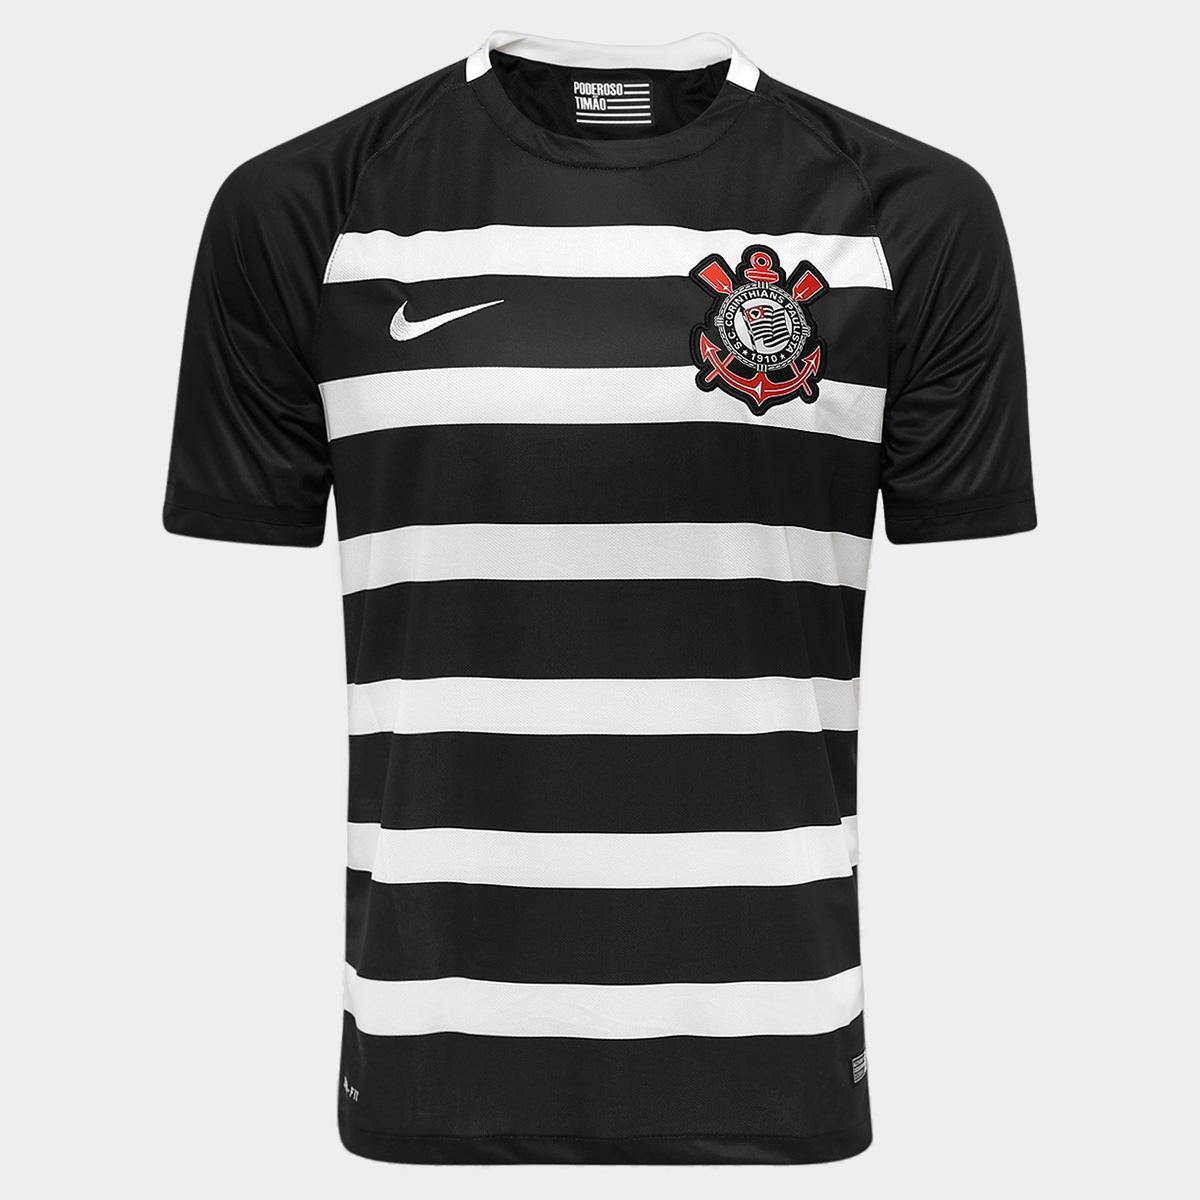 f3703e2b17 Camisa Corinthians II 15 16 s nº - Torcedor Nike Masculina - Compre Agora